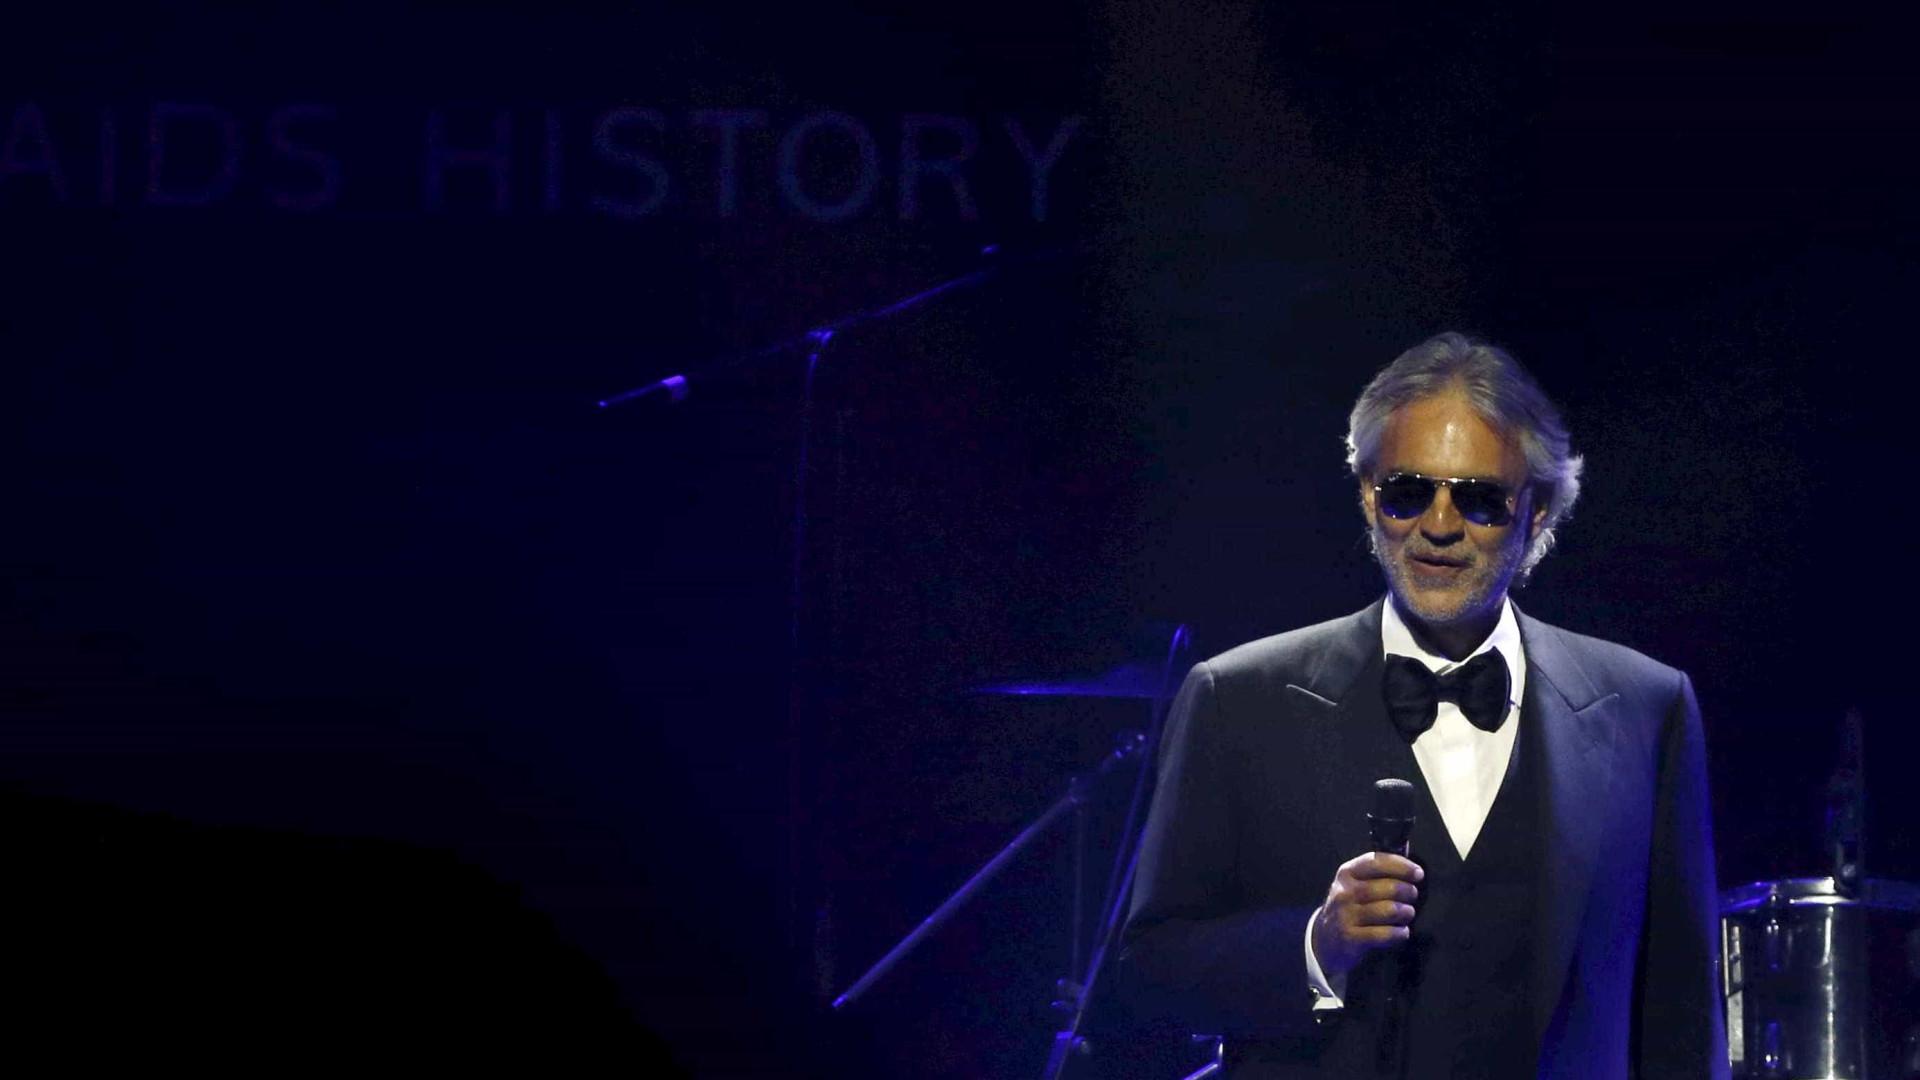 Bocelli revela torcida pelo Brasil na Copa antes de turnê no país